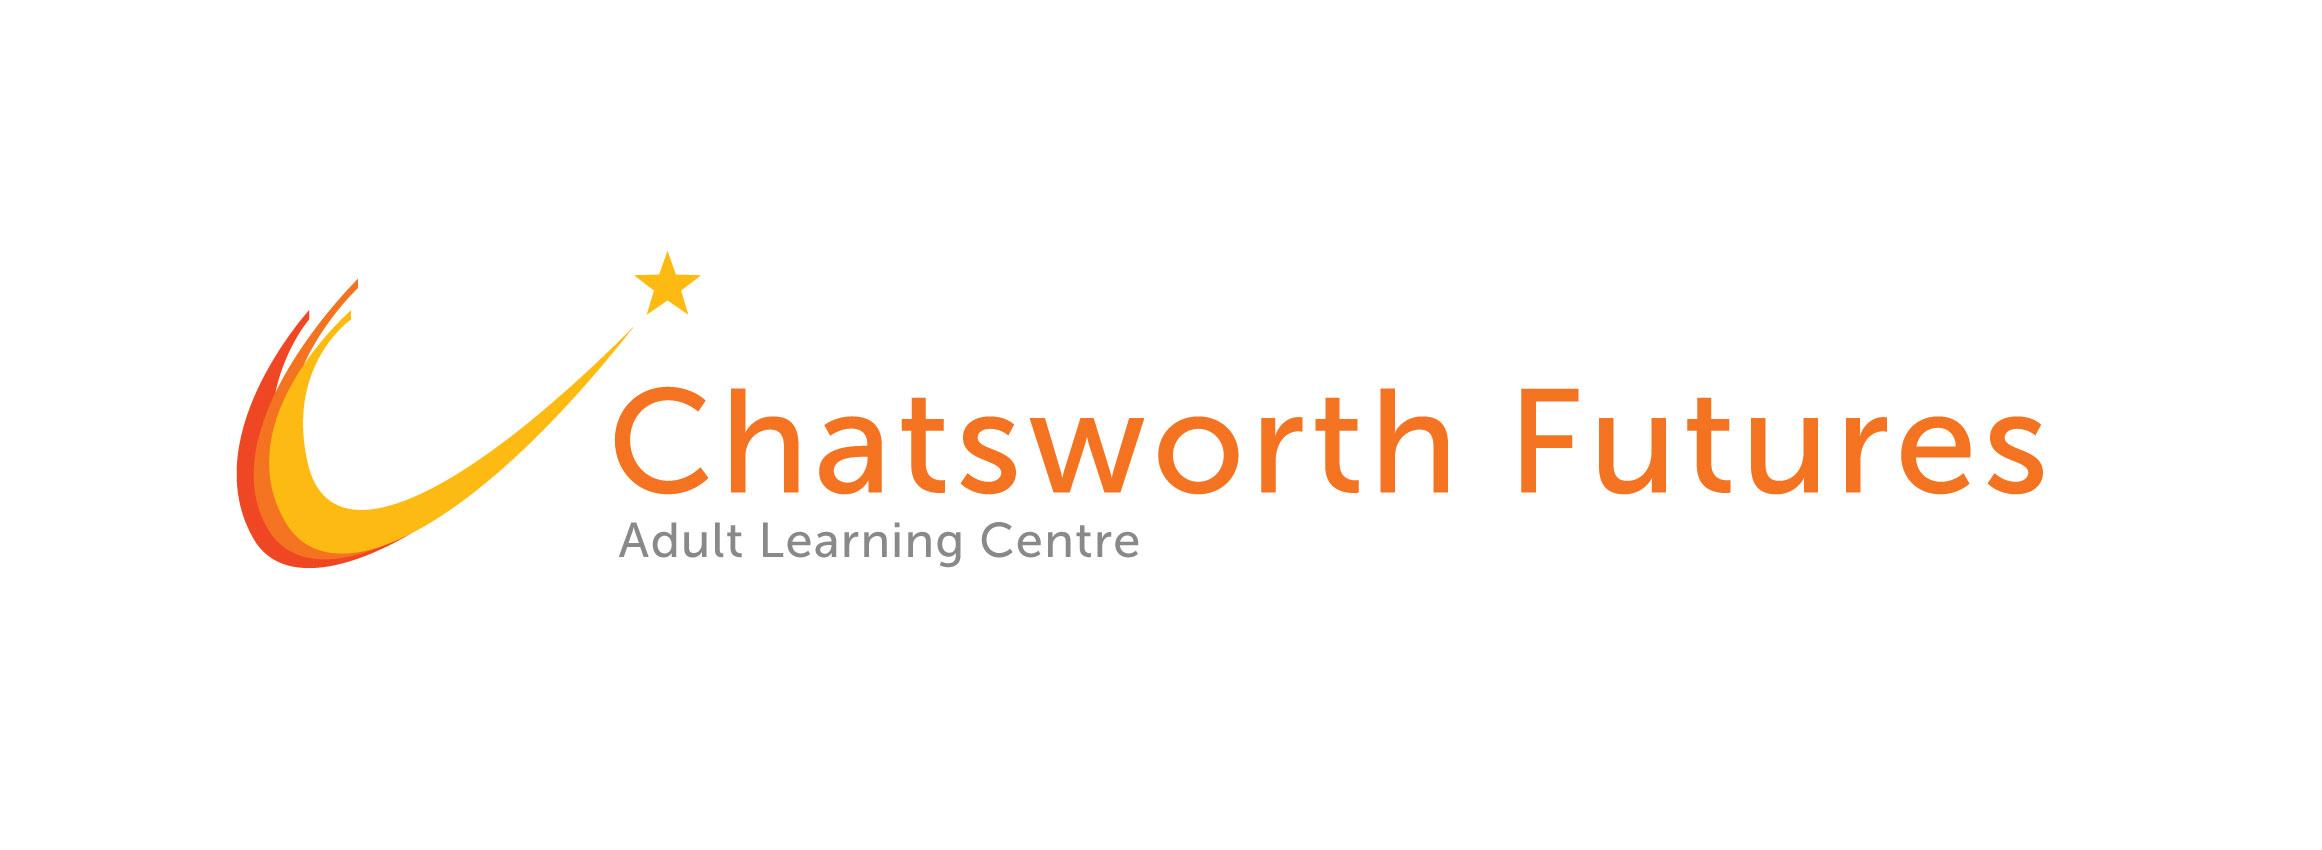 The logo of Chatsworth Futures